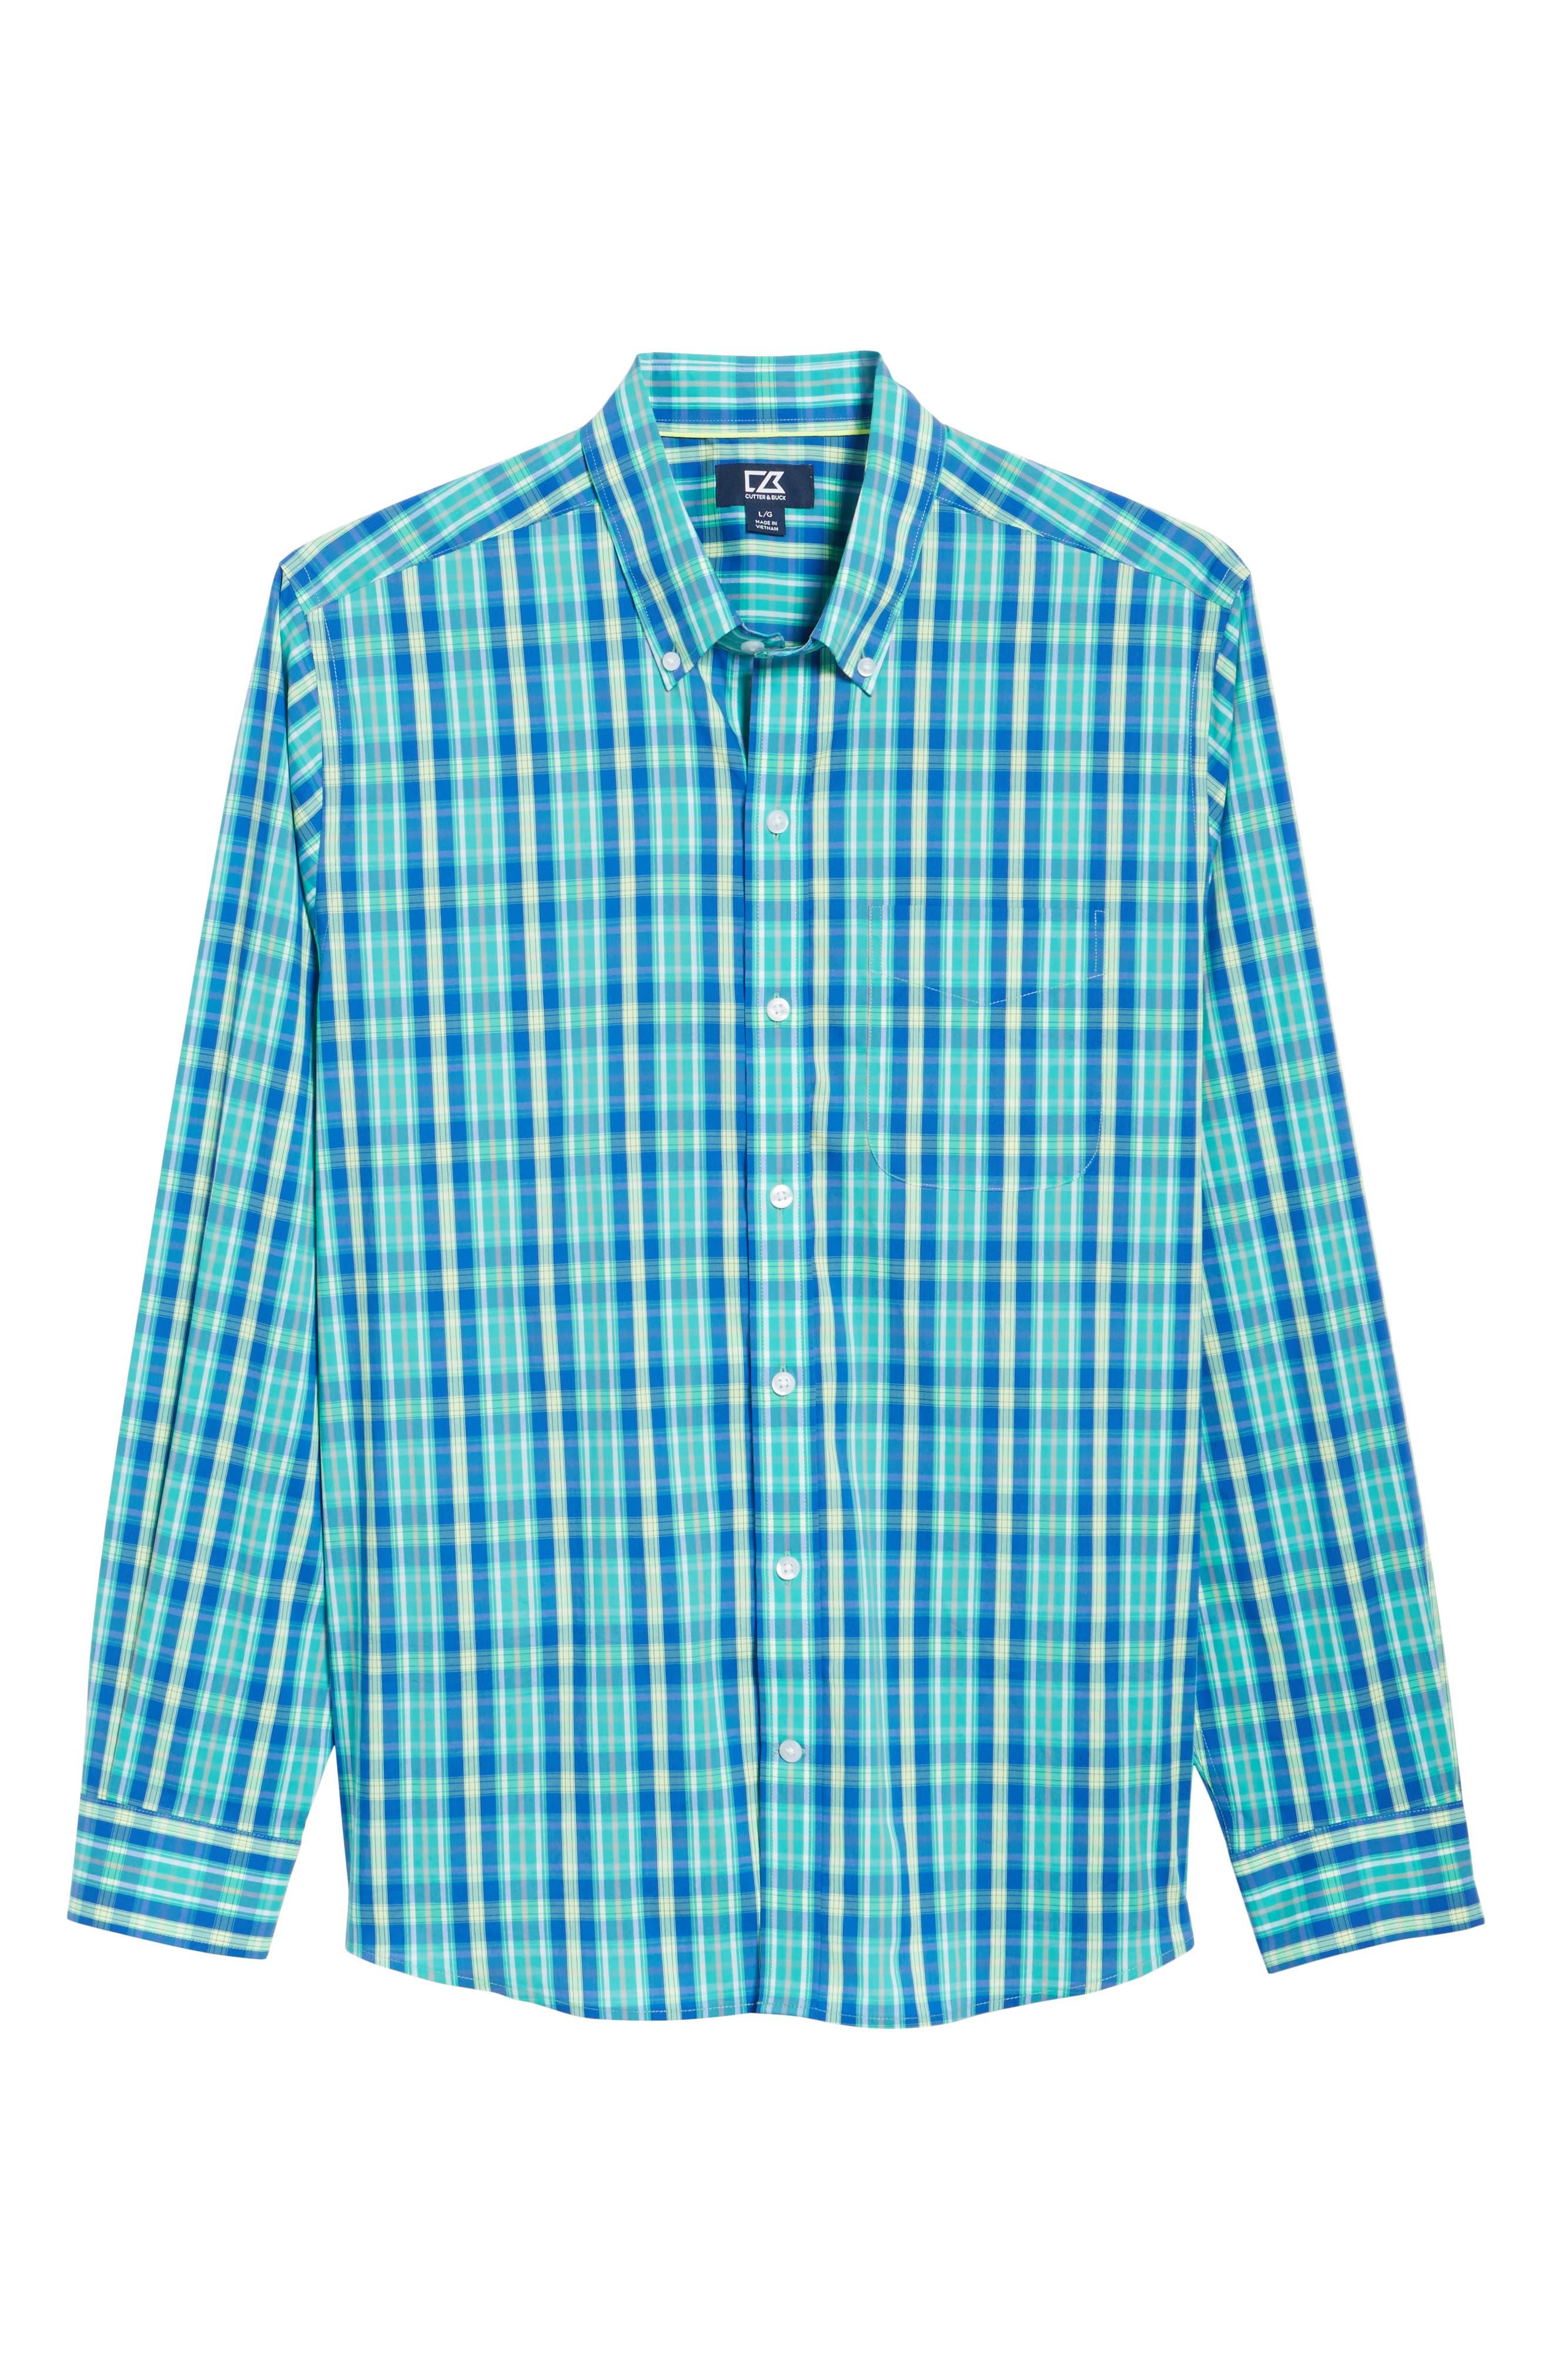 Carter Plaid Performance Sport Shirt,                             Alternate thumbnail 6, color,                             752